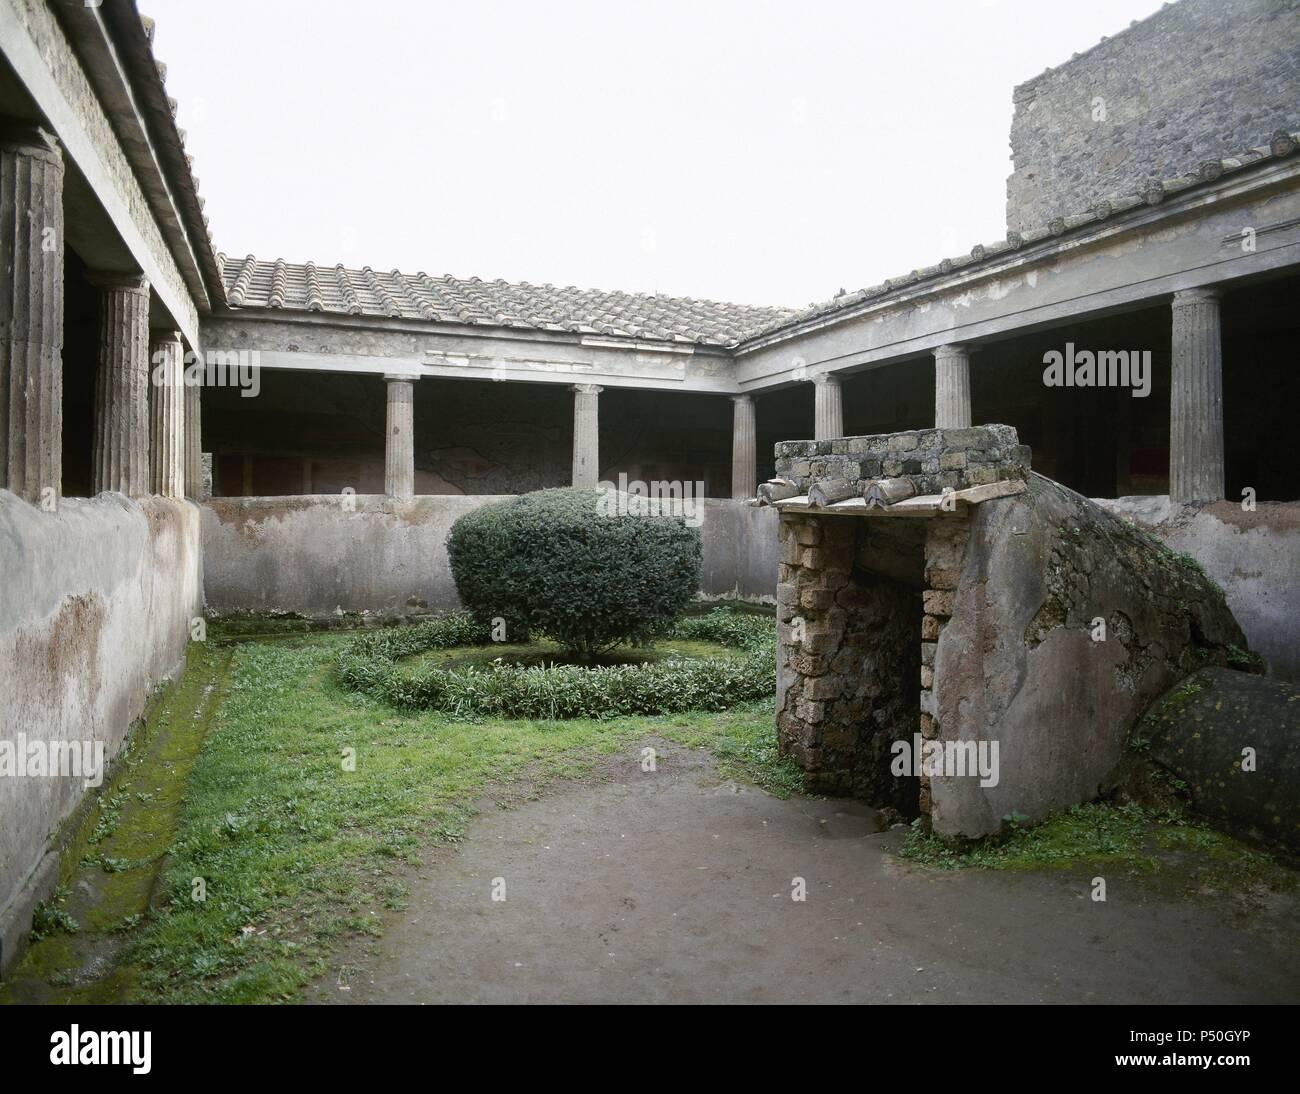 Pompeii. Ancient Roman city. Villa of the Mysteries. Courtyard. Campania, Italy. - Stock Image